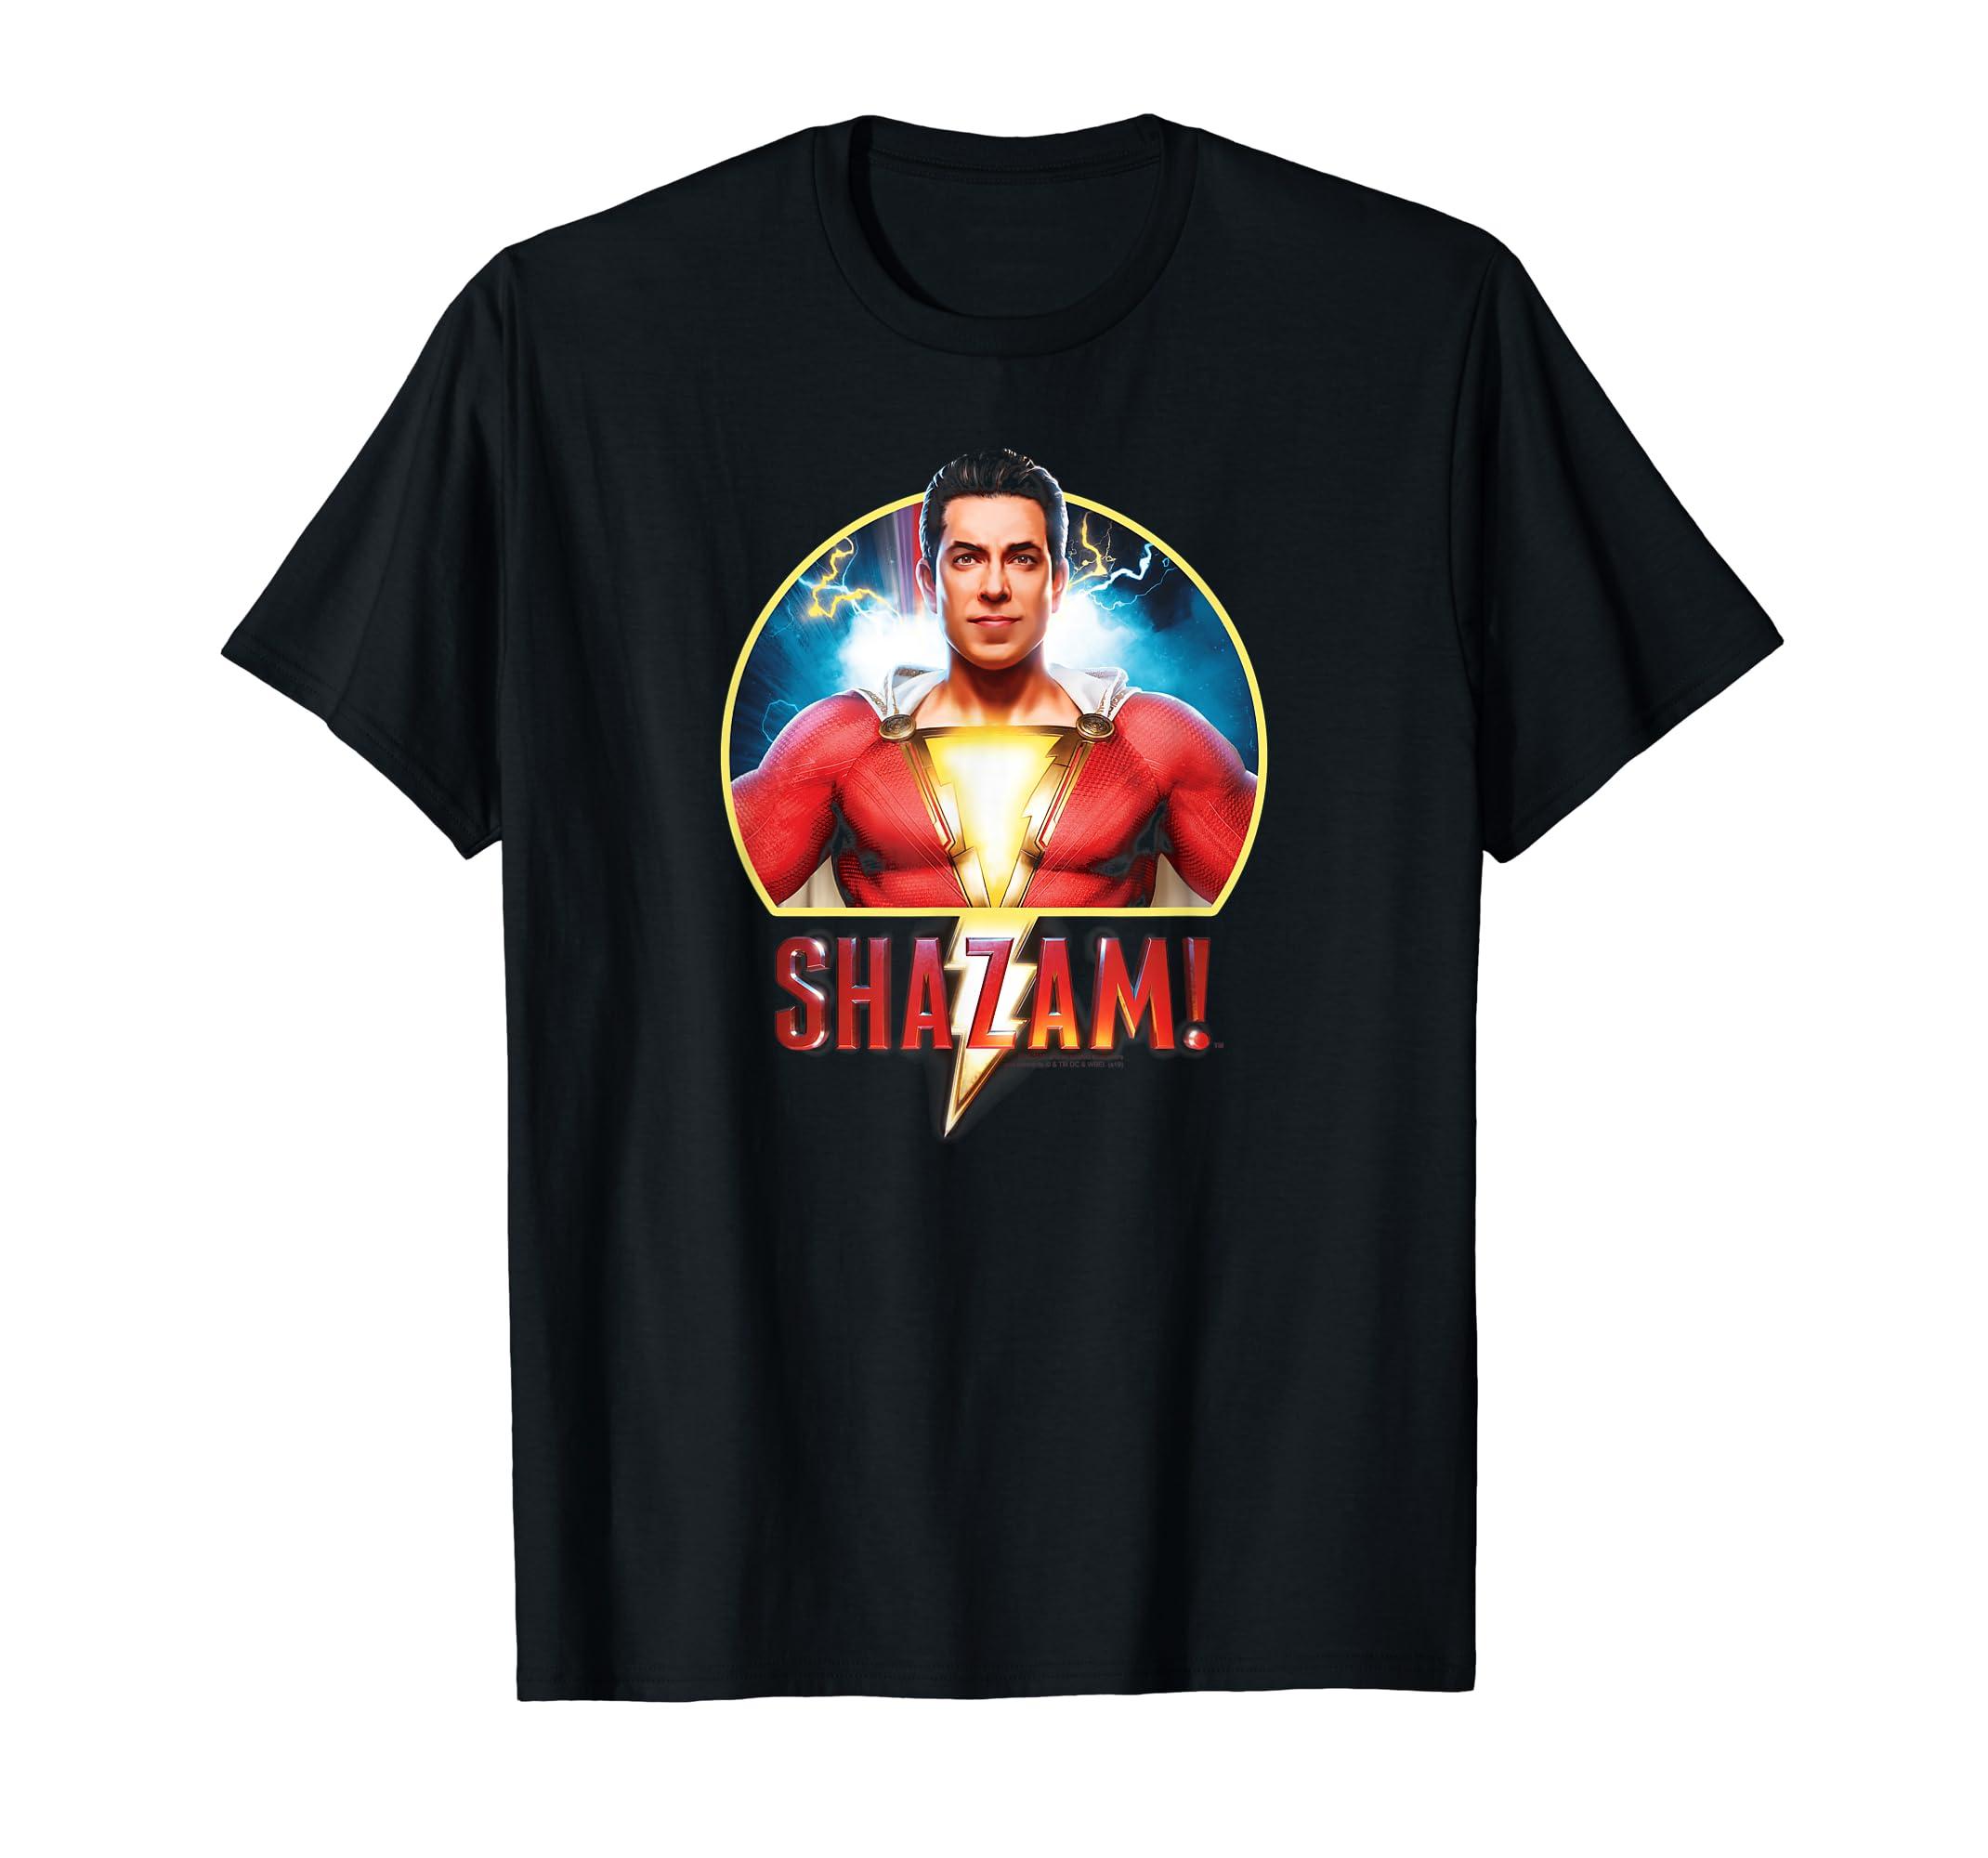 4ea603e57e Amazon.com: Shazam! Movie Portrait T Shirt: Clothing